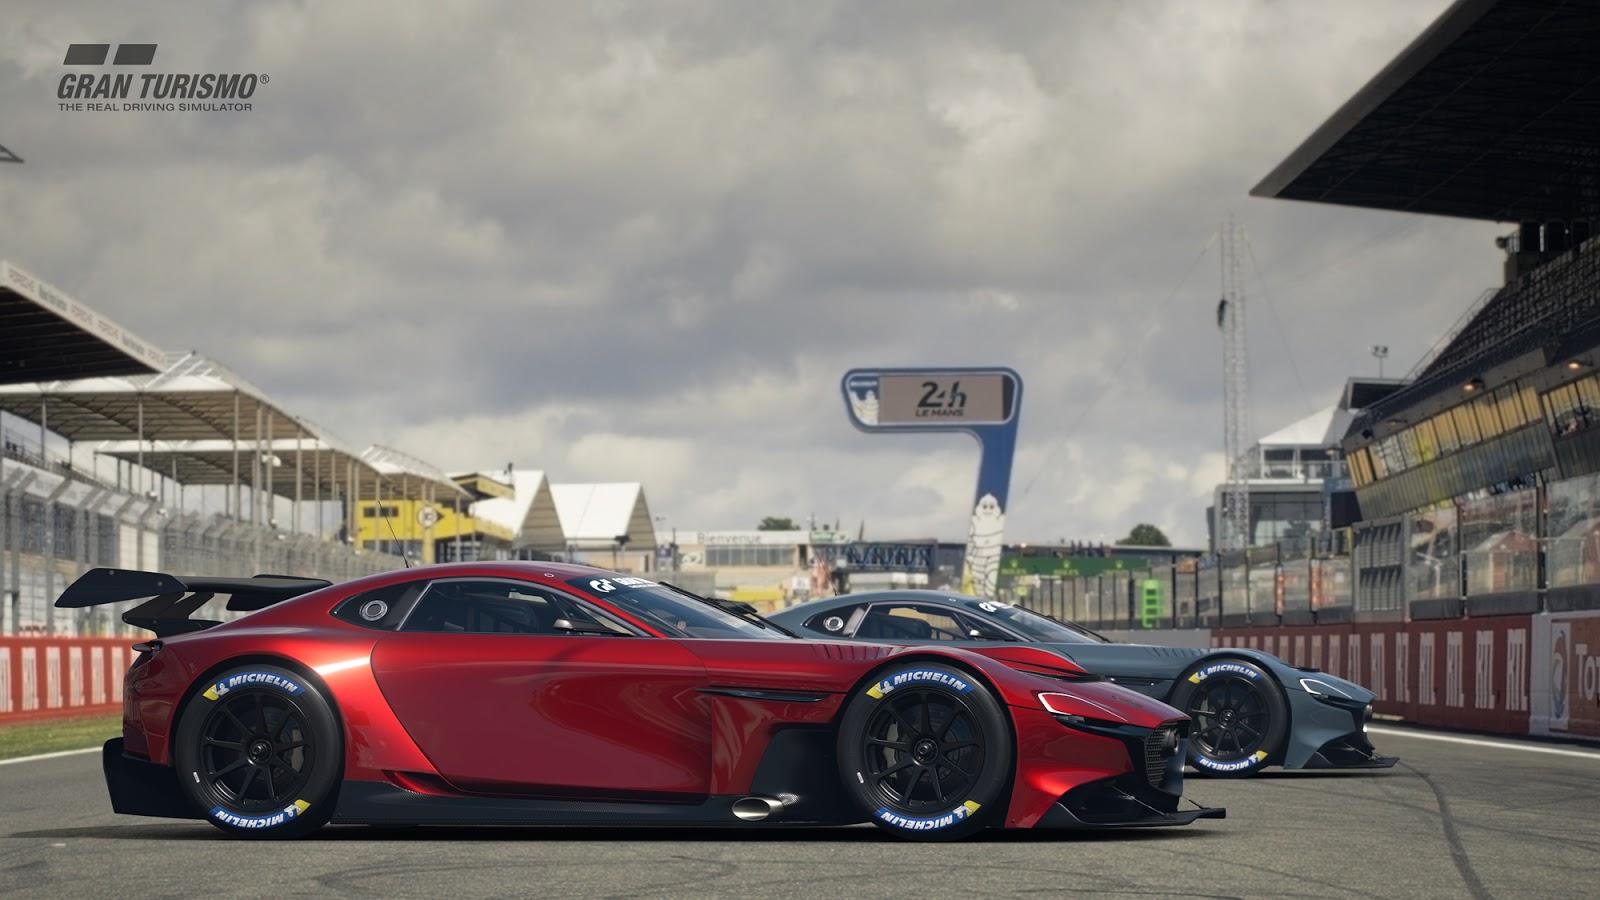 To Mazda RX-Vision επιστρέφει (στο Playstation) Mazda, Mazda RX-7, Mazda RX-Vision Concept, Mazda RX8, zblog, αγωνες, ΦΩΤΟ, φωτογραφίες